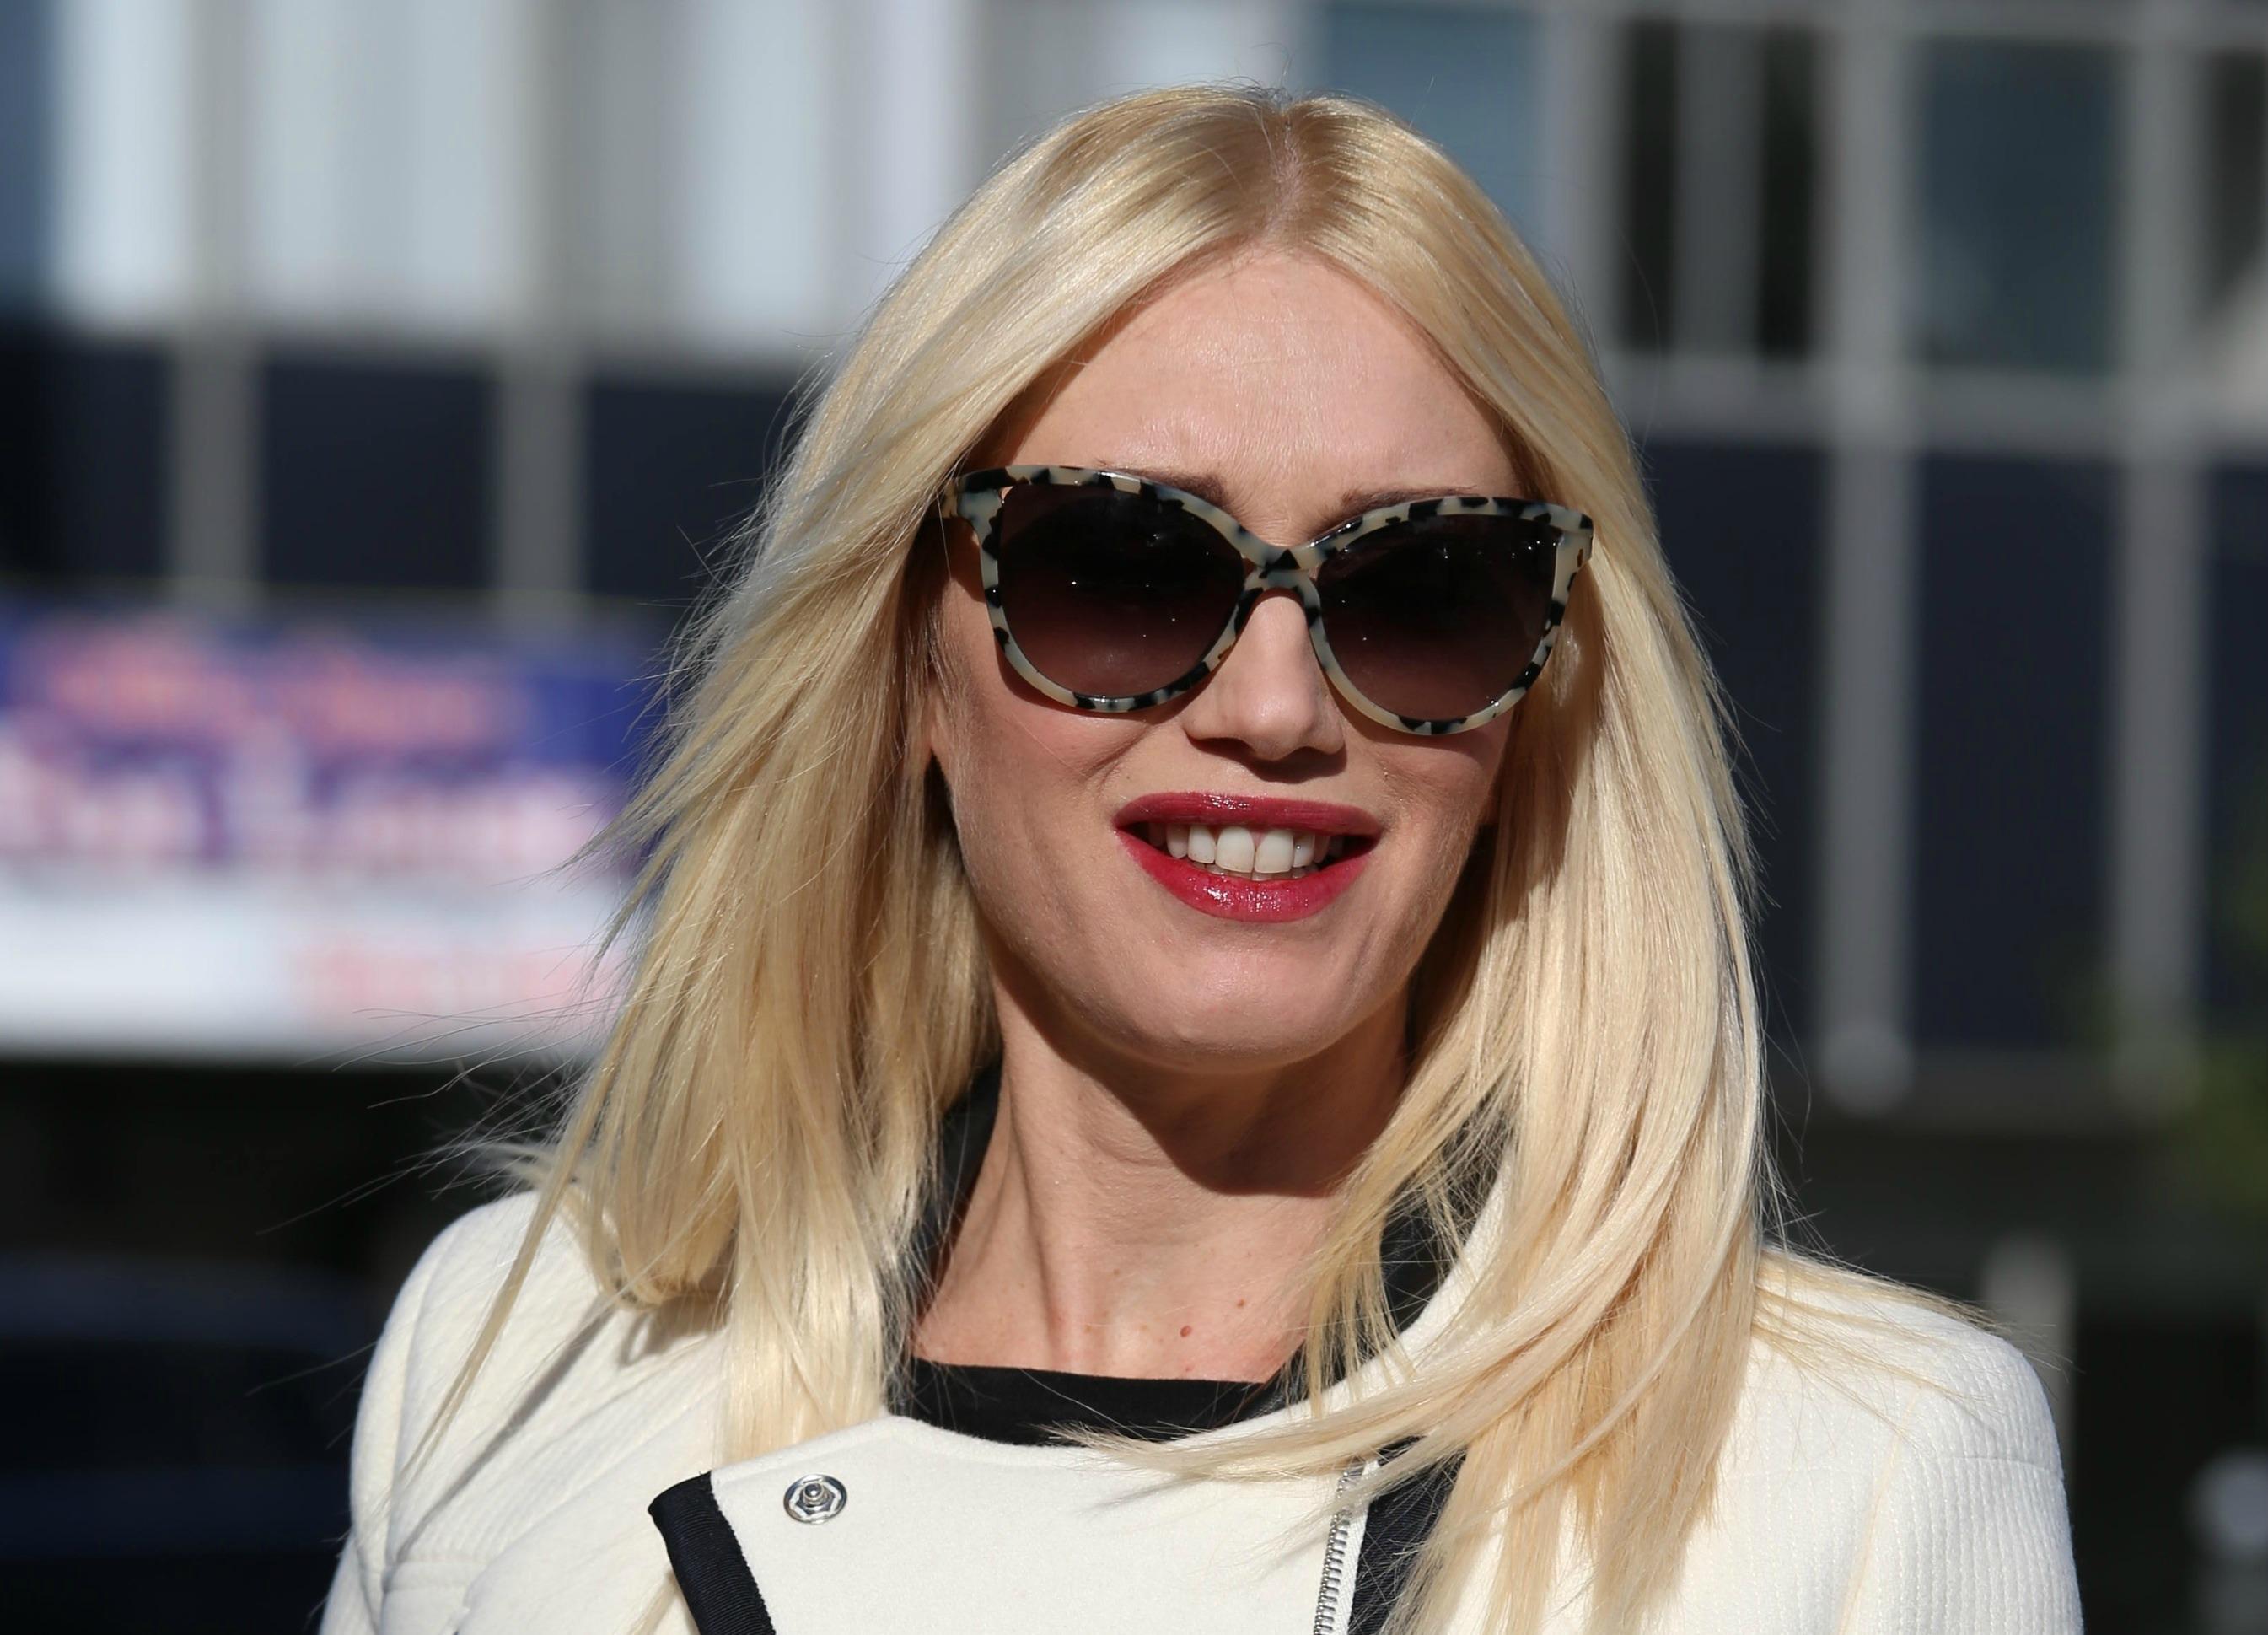 Gwen Stefani replacing Christina Aguilera as The Voice judge